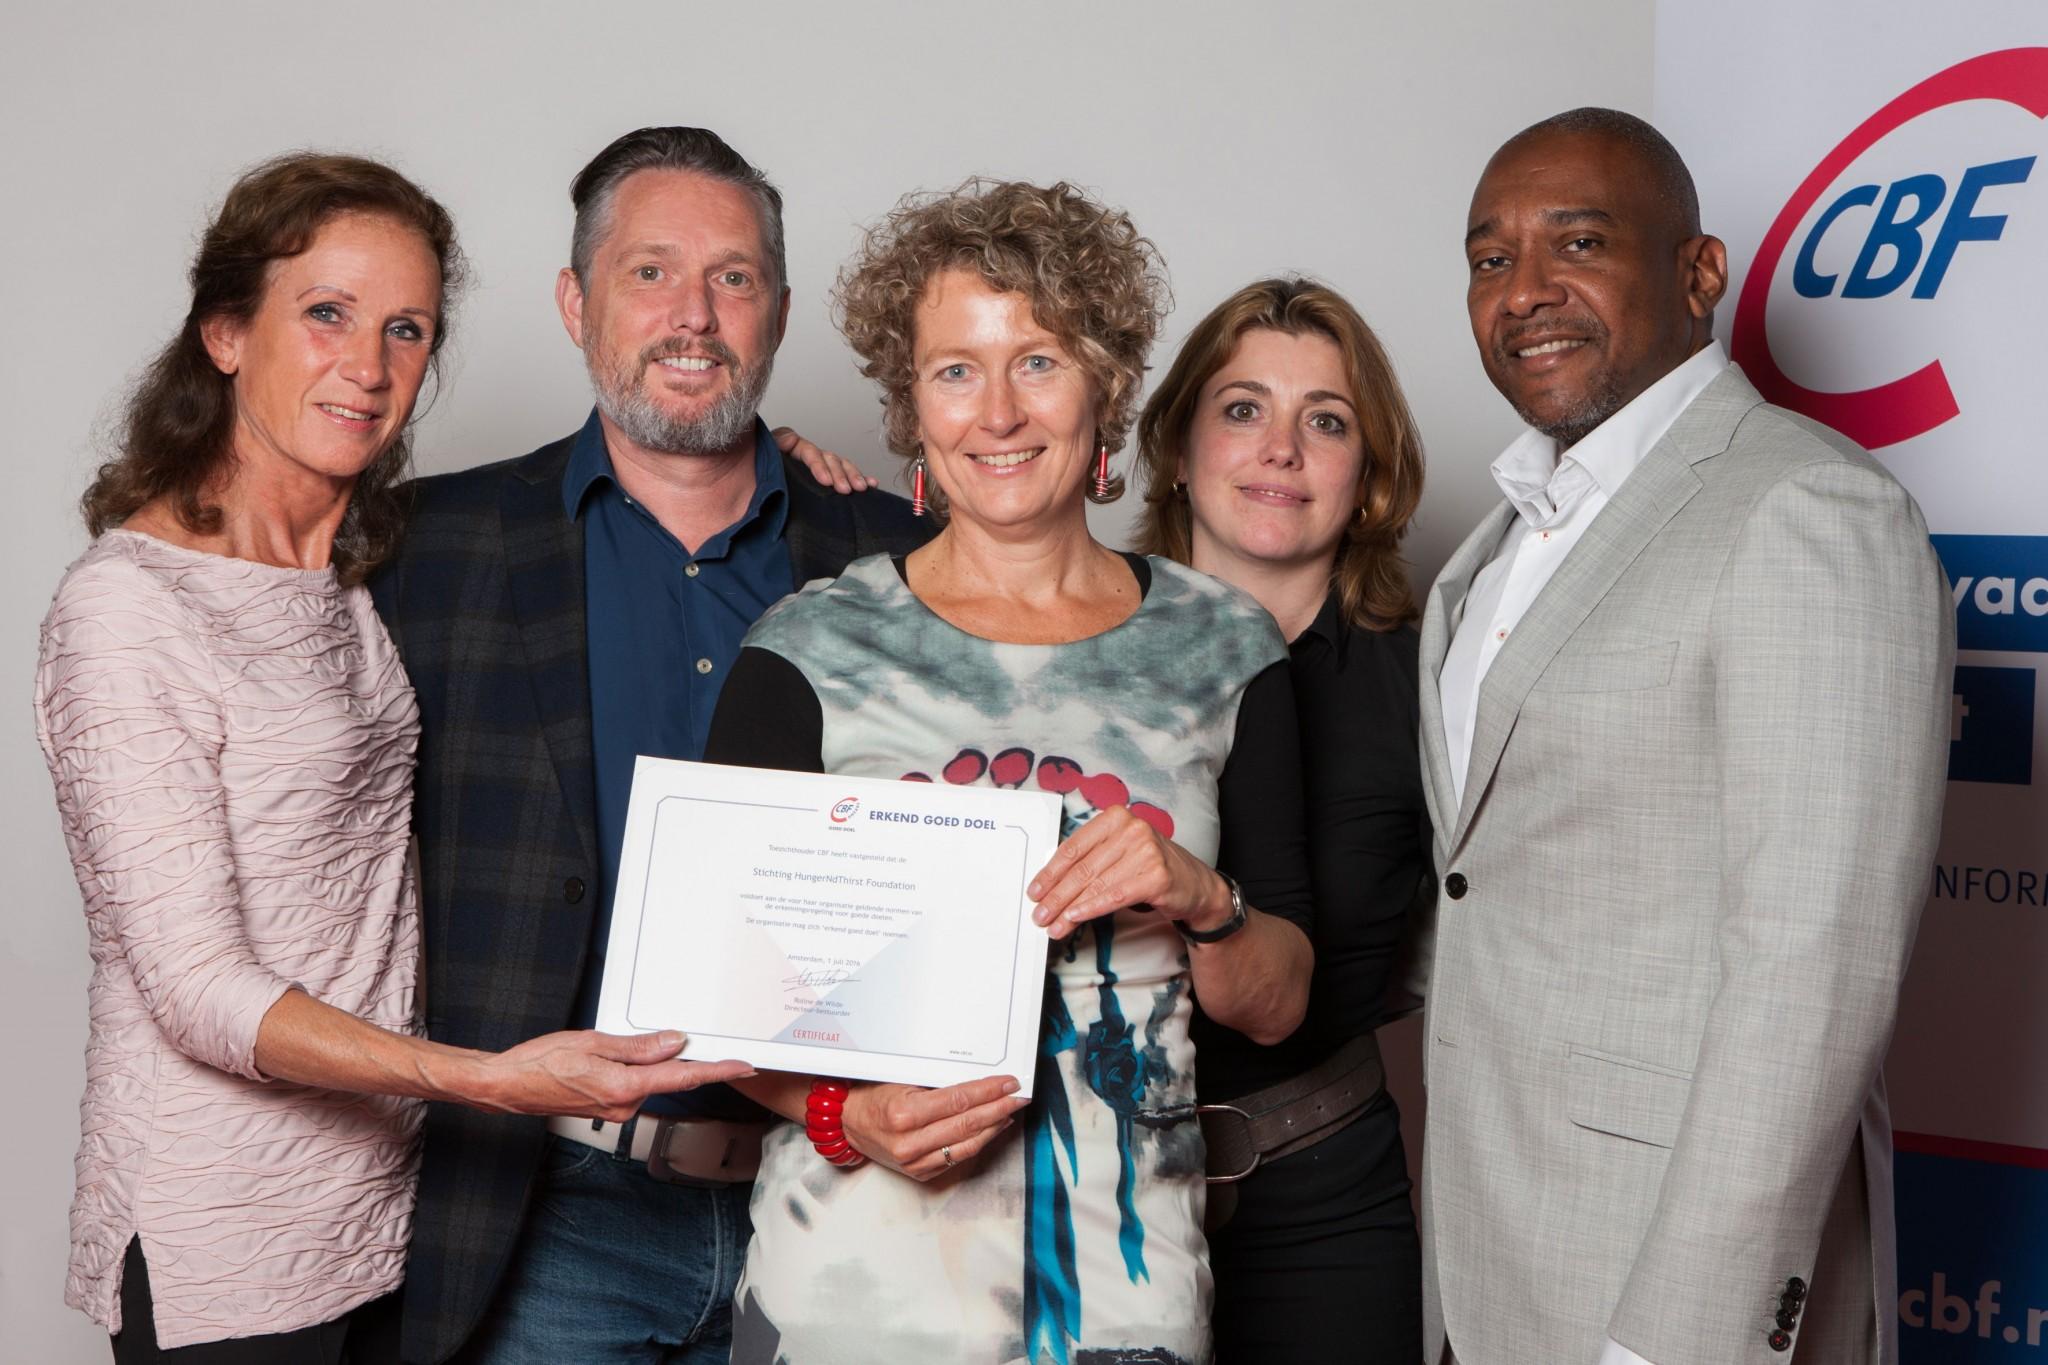 HungerNdThirst krijgt CBF-Erkenning